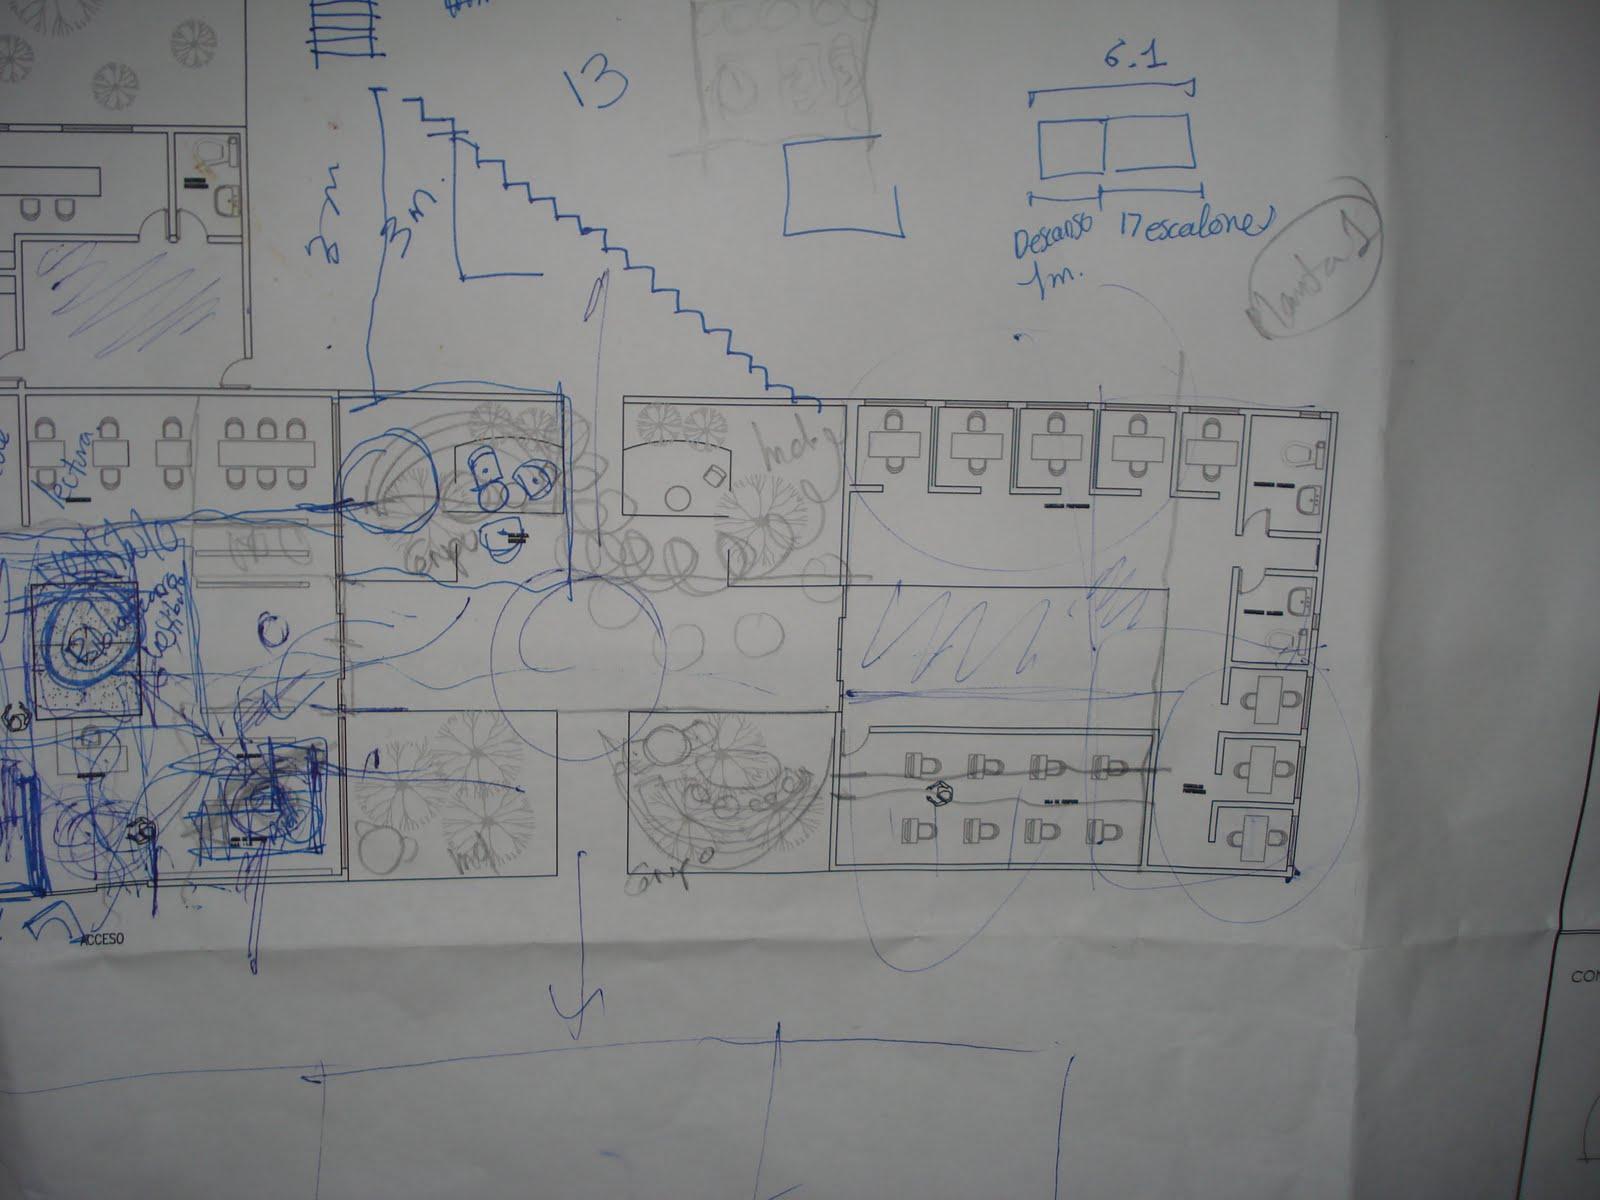 Proceso de dise o arquitectonico escuela superior de for Planta arquitectonica biblioteca